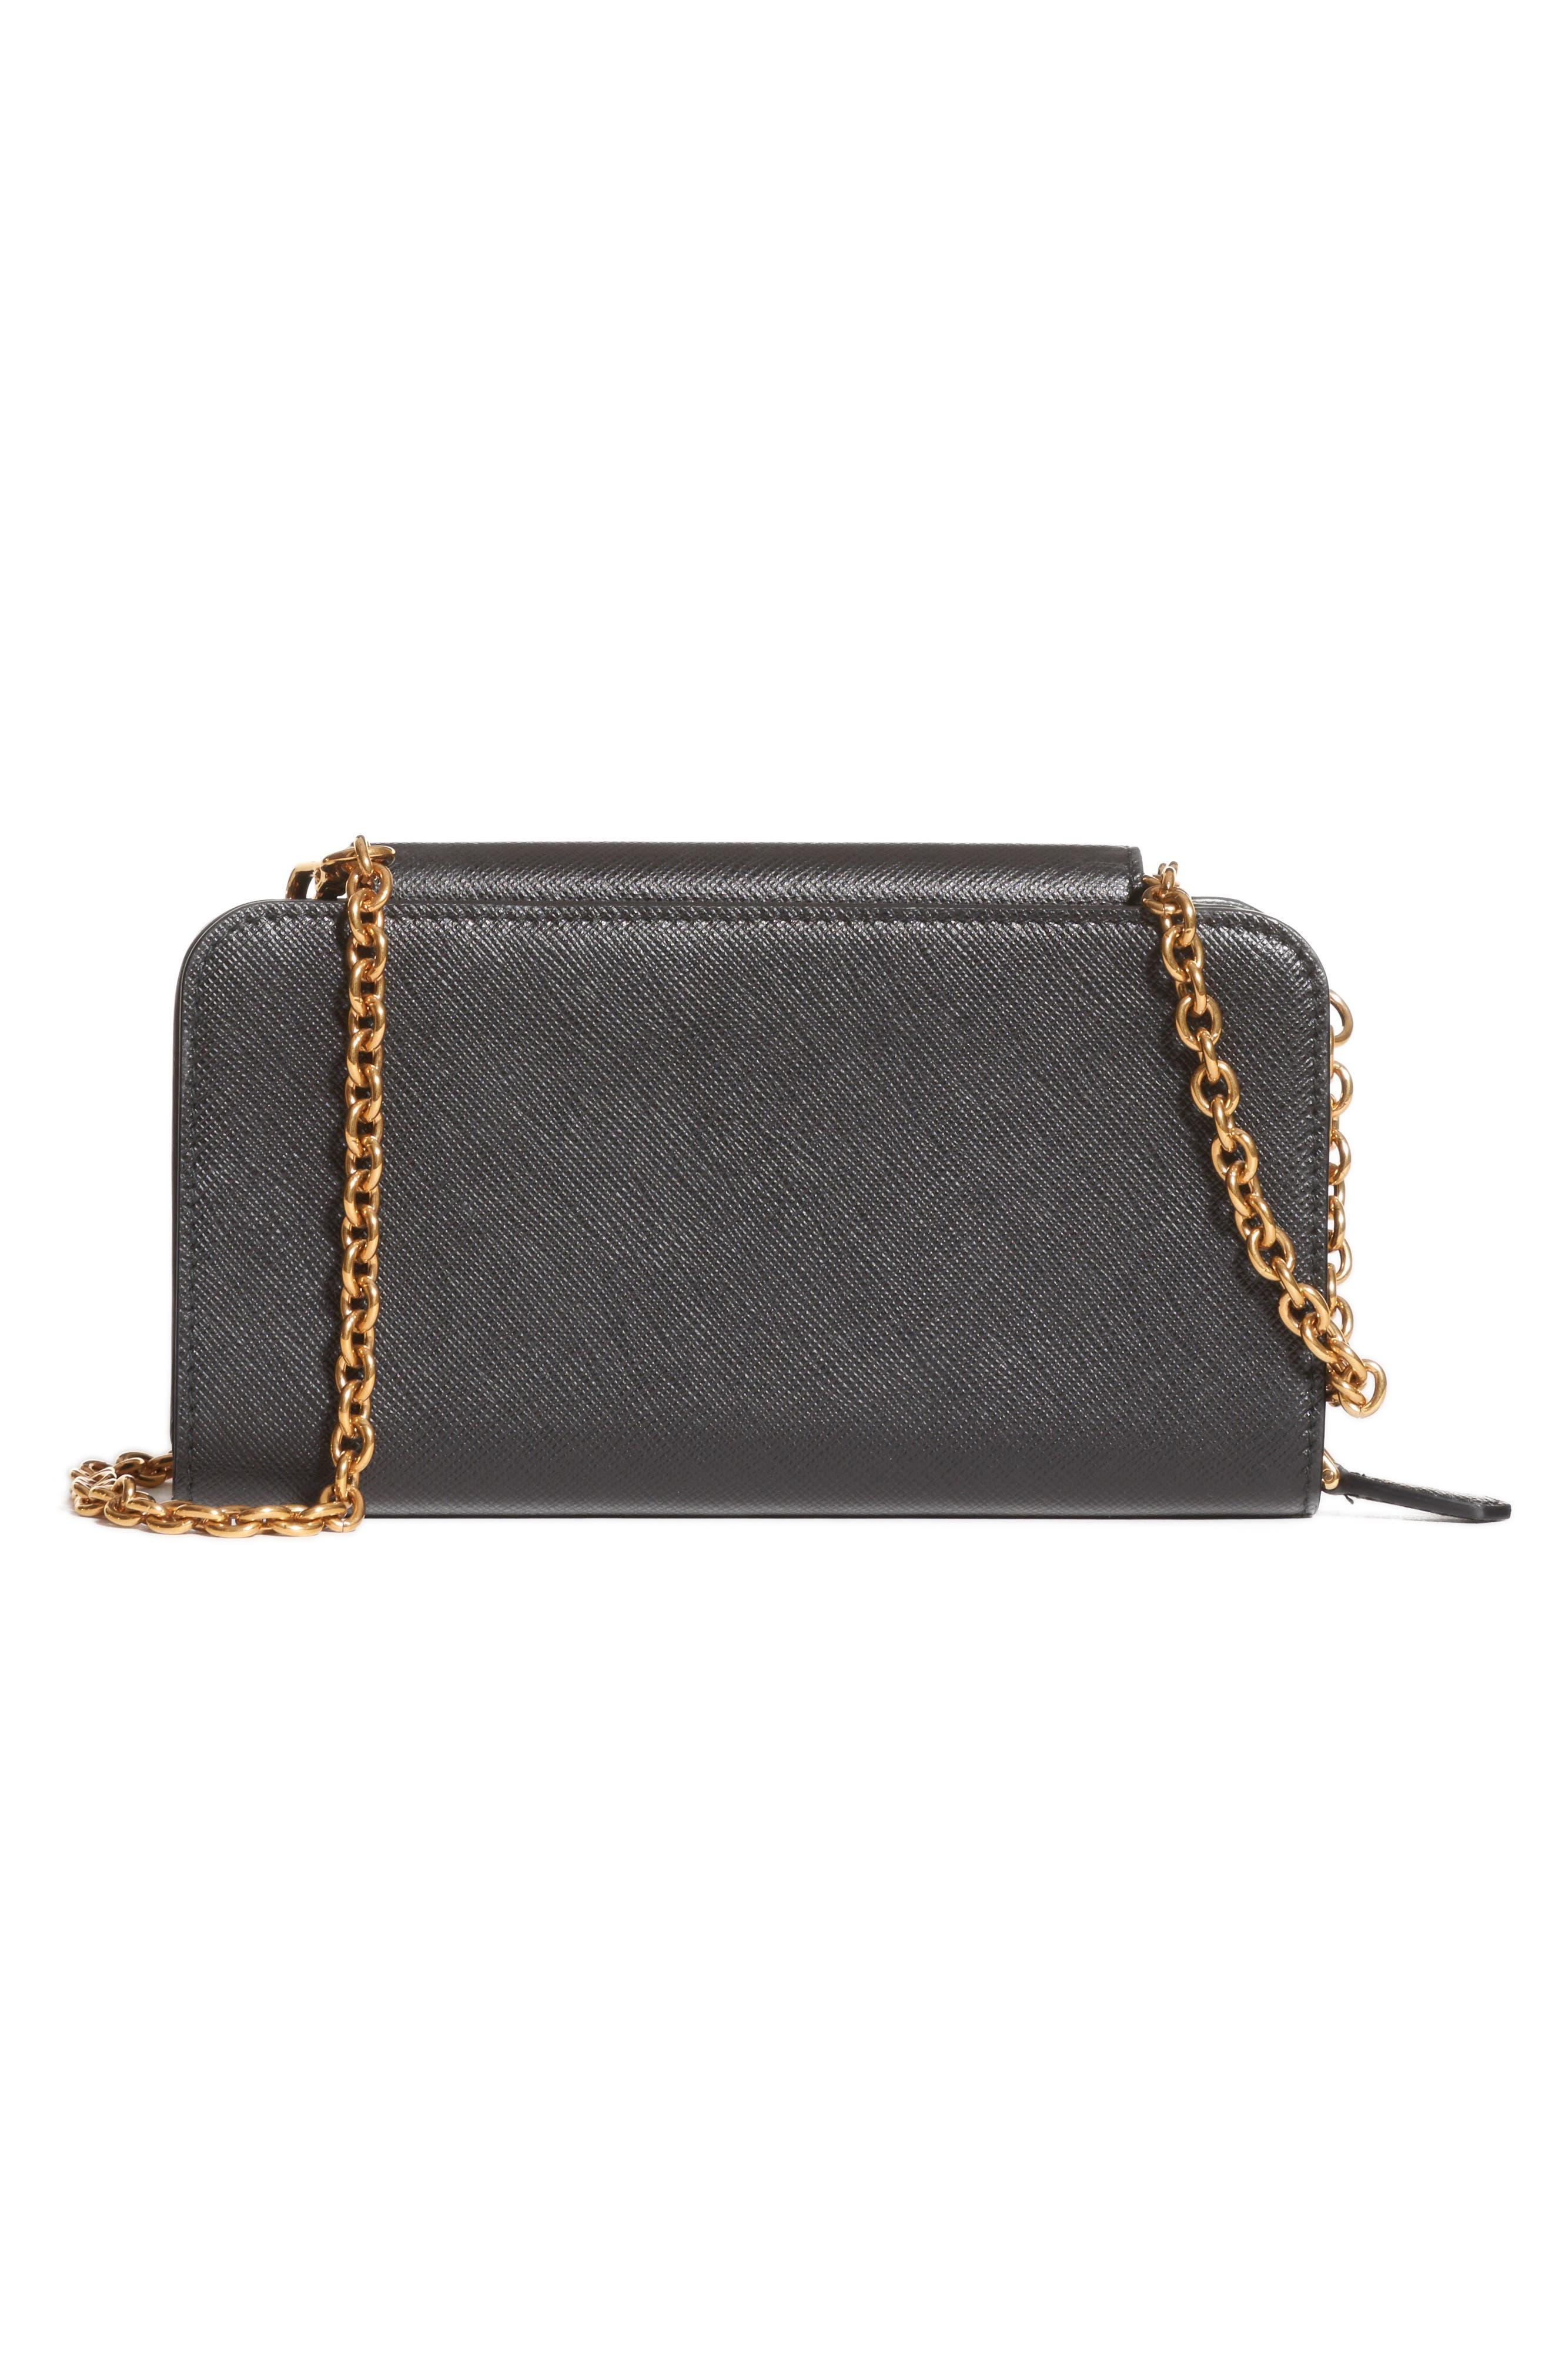 PRADA, Saffiano Leather Wallet on a Chain, Alternate thumbnail 4, color, NERO